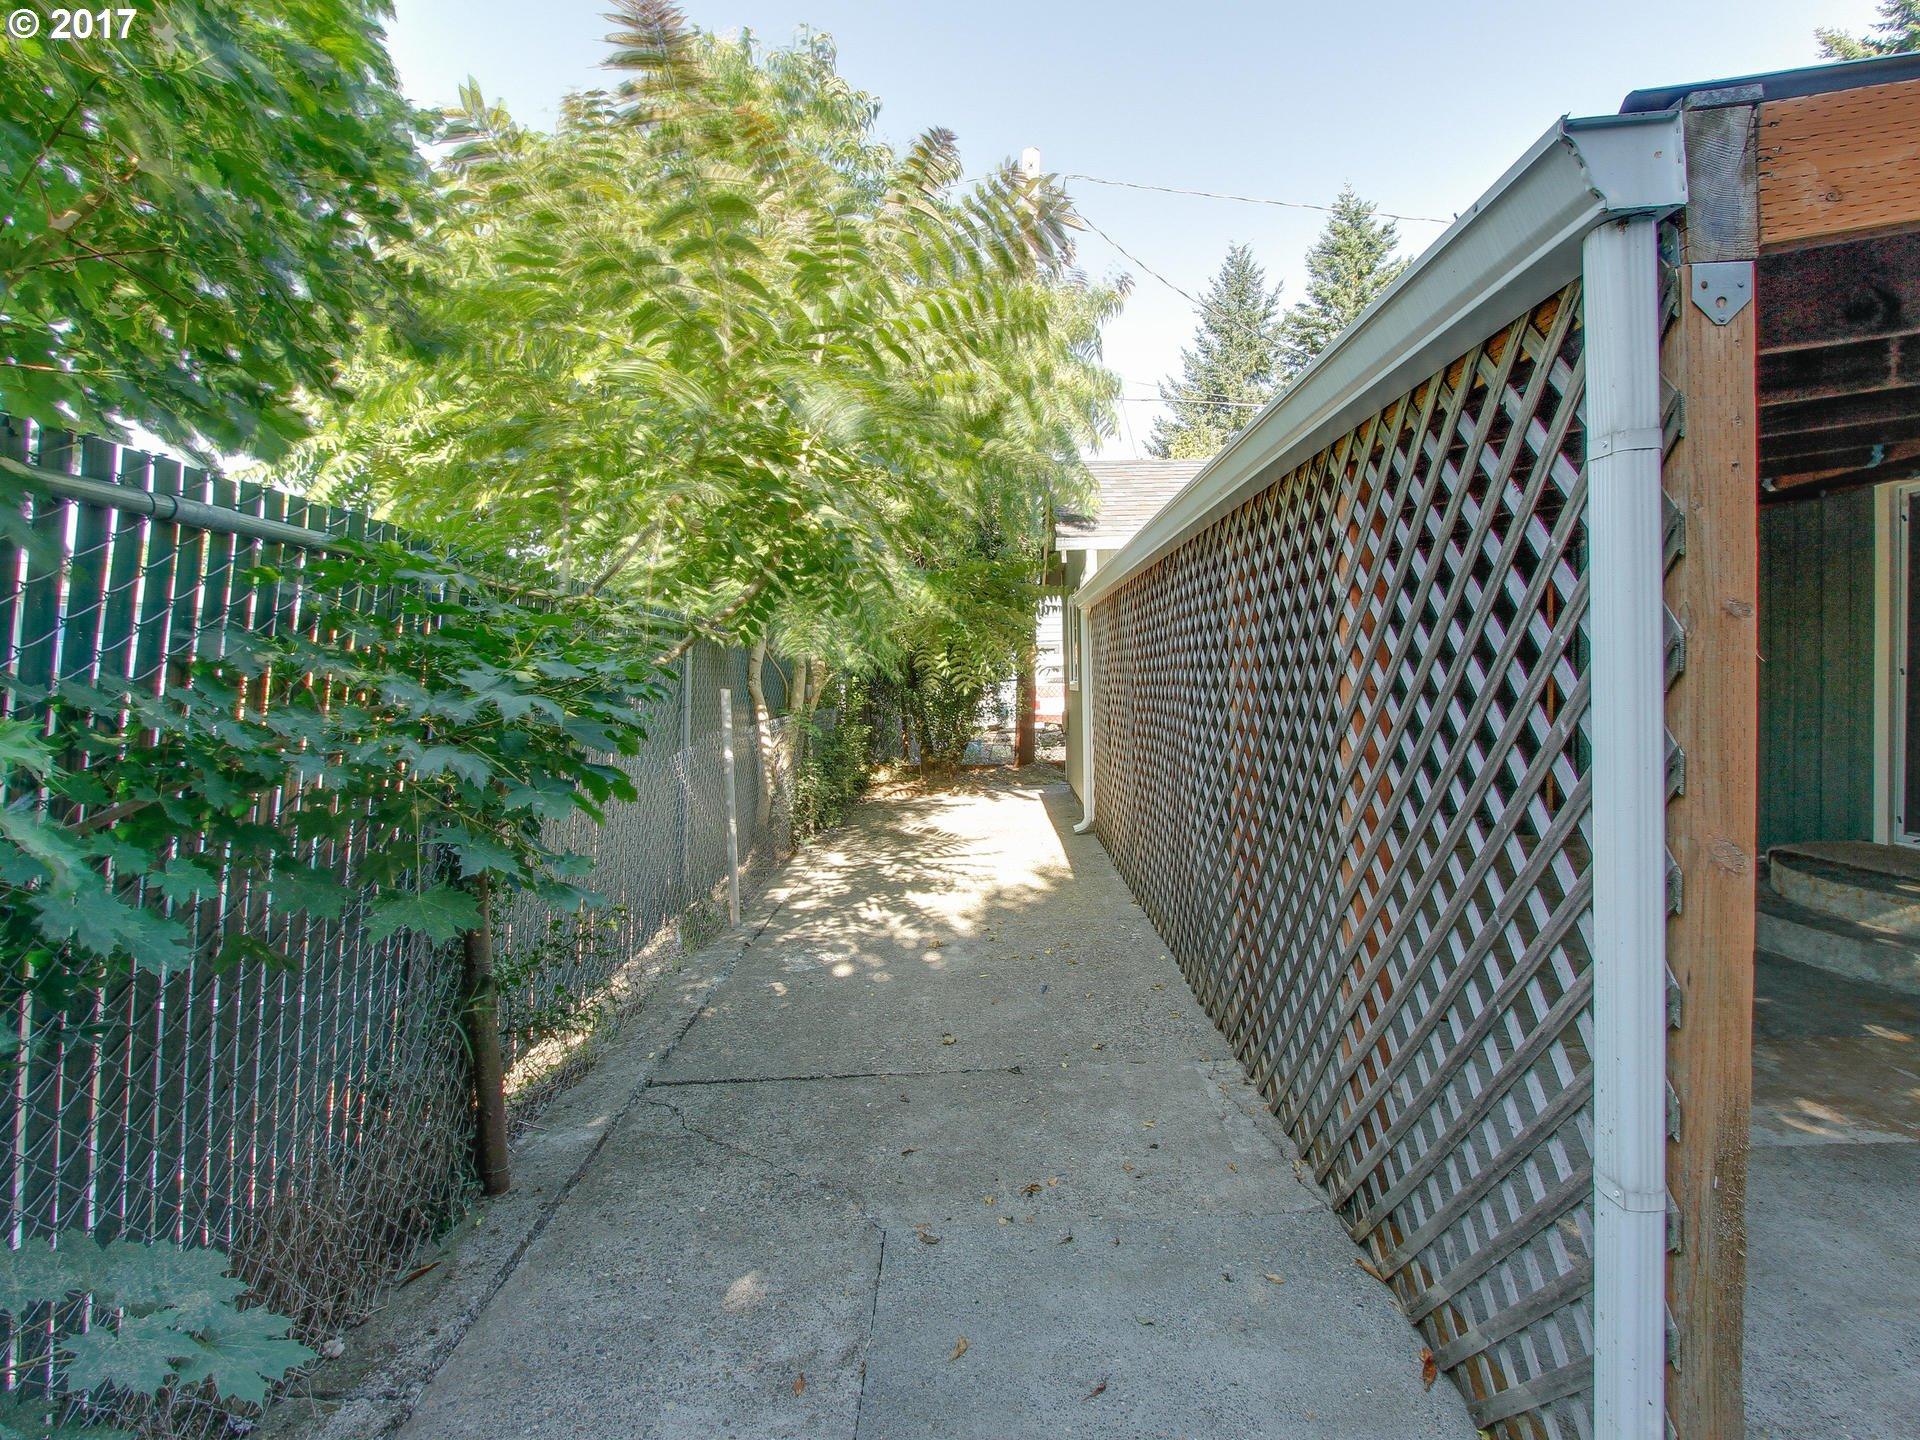 616 HOLMES LN Oregon City, OR 97045 - MLS #: 17698472